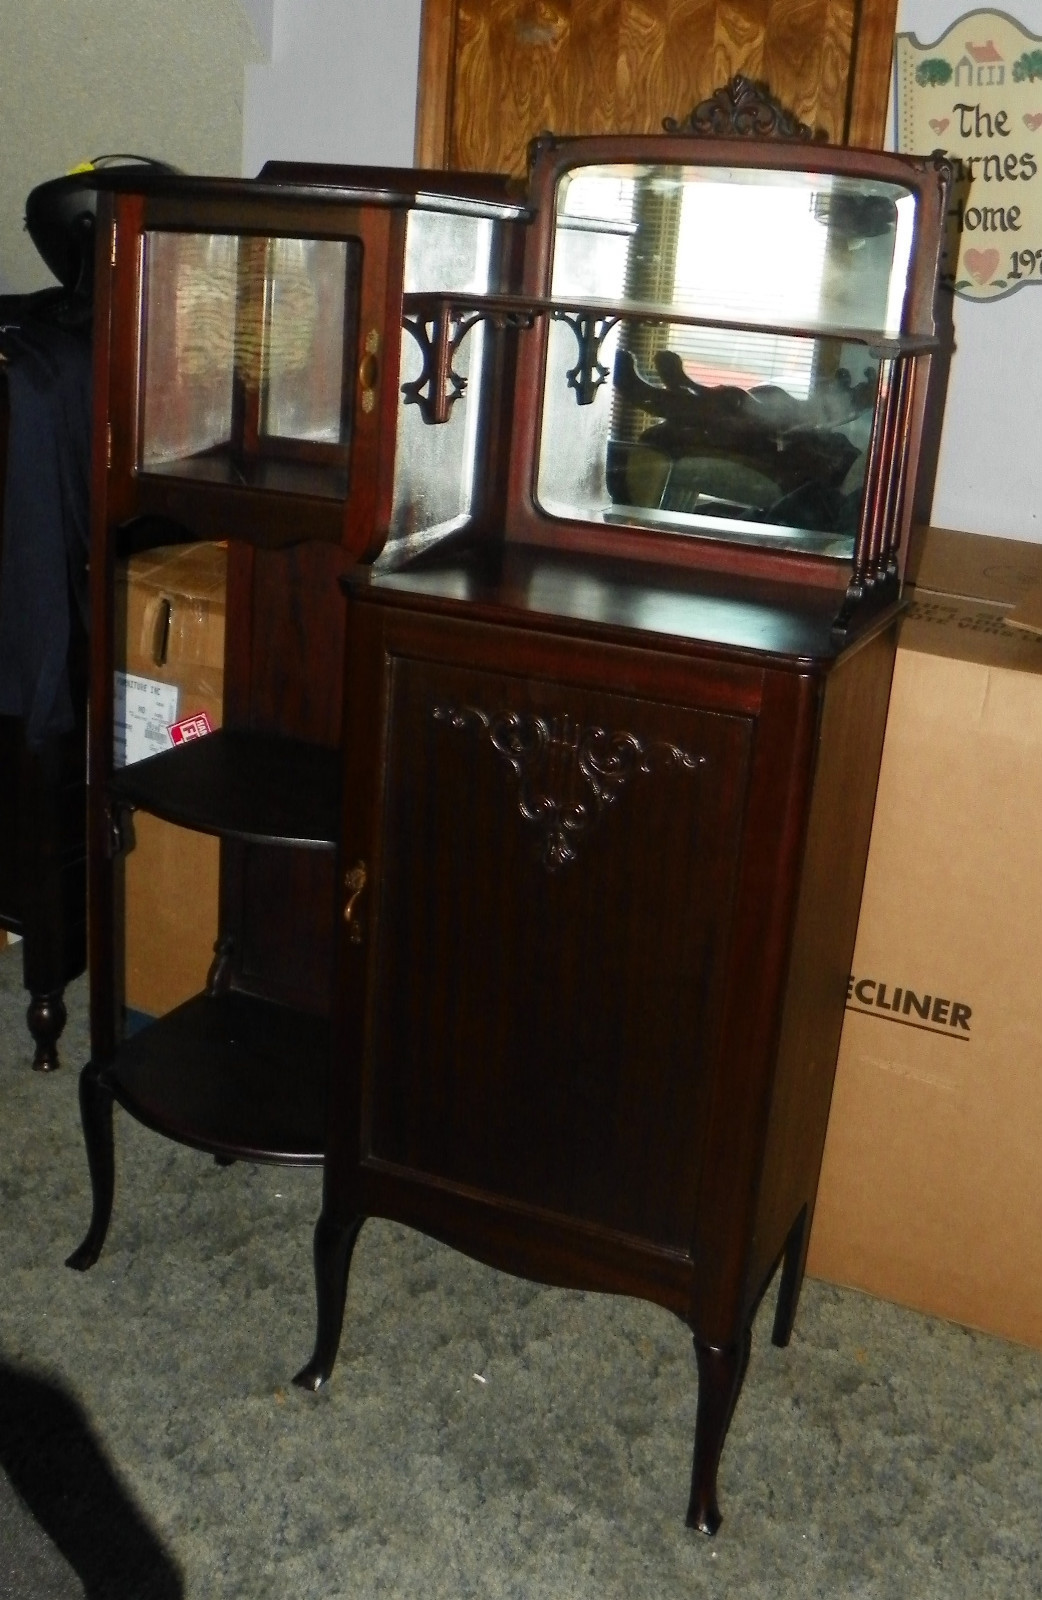 used etagere for sale 221 ads in us. Black Bedroom Furniture Sets. Home Design Ideas